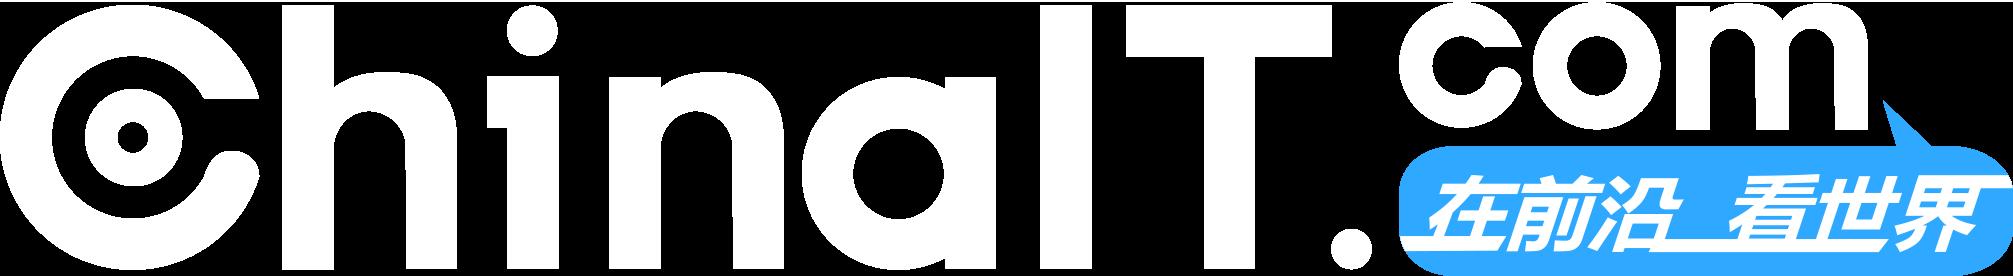 ChinaIT汇聚 IT 世界的思考者和观察者,聚焦 IT 前沿技术,紧跟最新科技潮流。这里提供有深度的内容,激荡有价值的思考,可帮您拨开数字空间迷雾,洞悉IT 世界趋势。